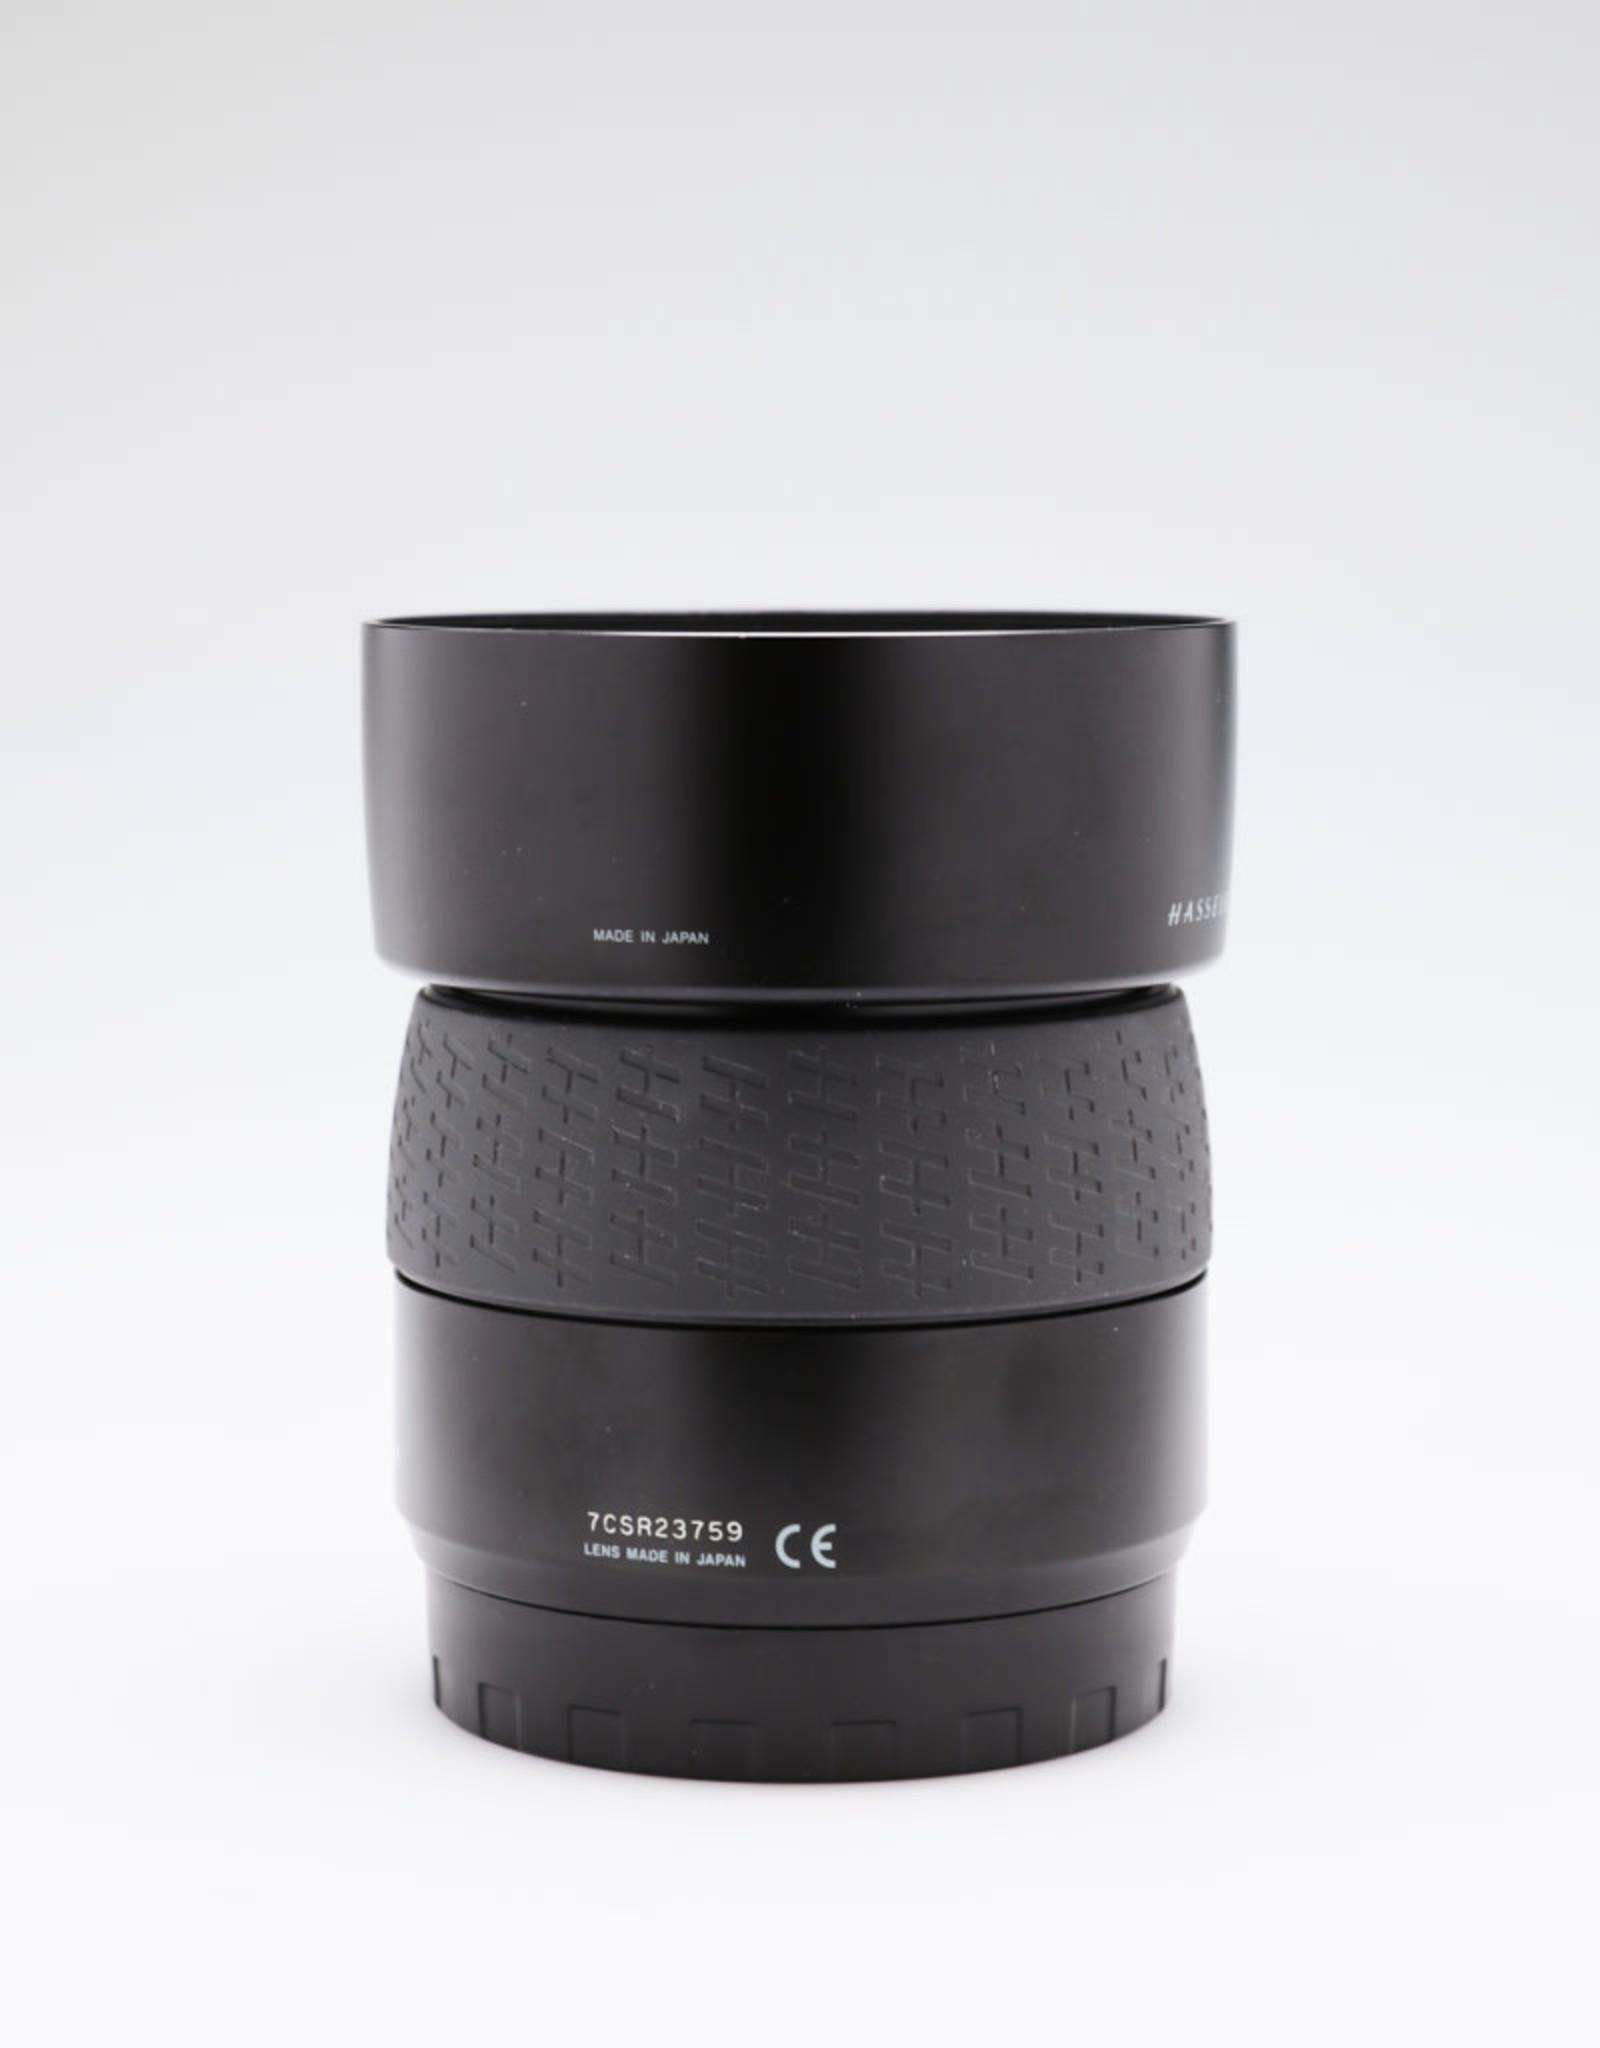 Hasselblad USED  Hasselblad HC 80mm F2.8 Lens